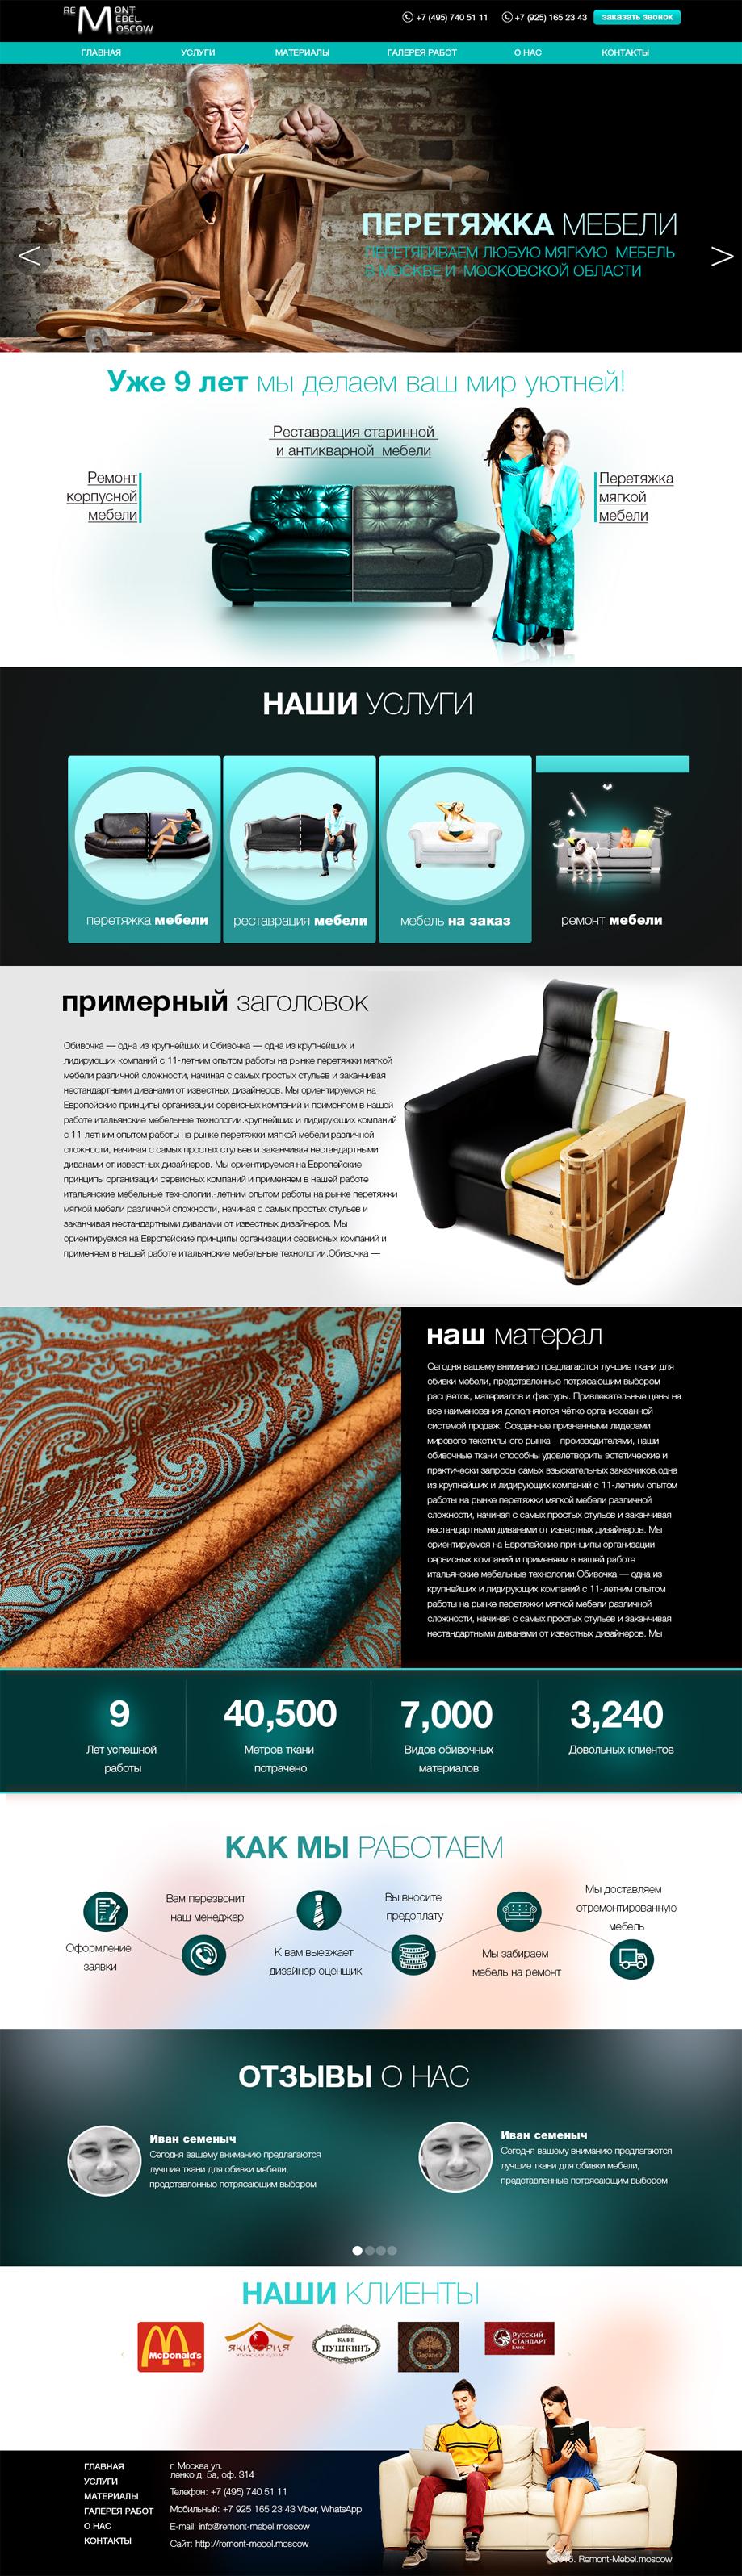 Дизайн лендинга перетяжка мебели